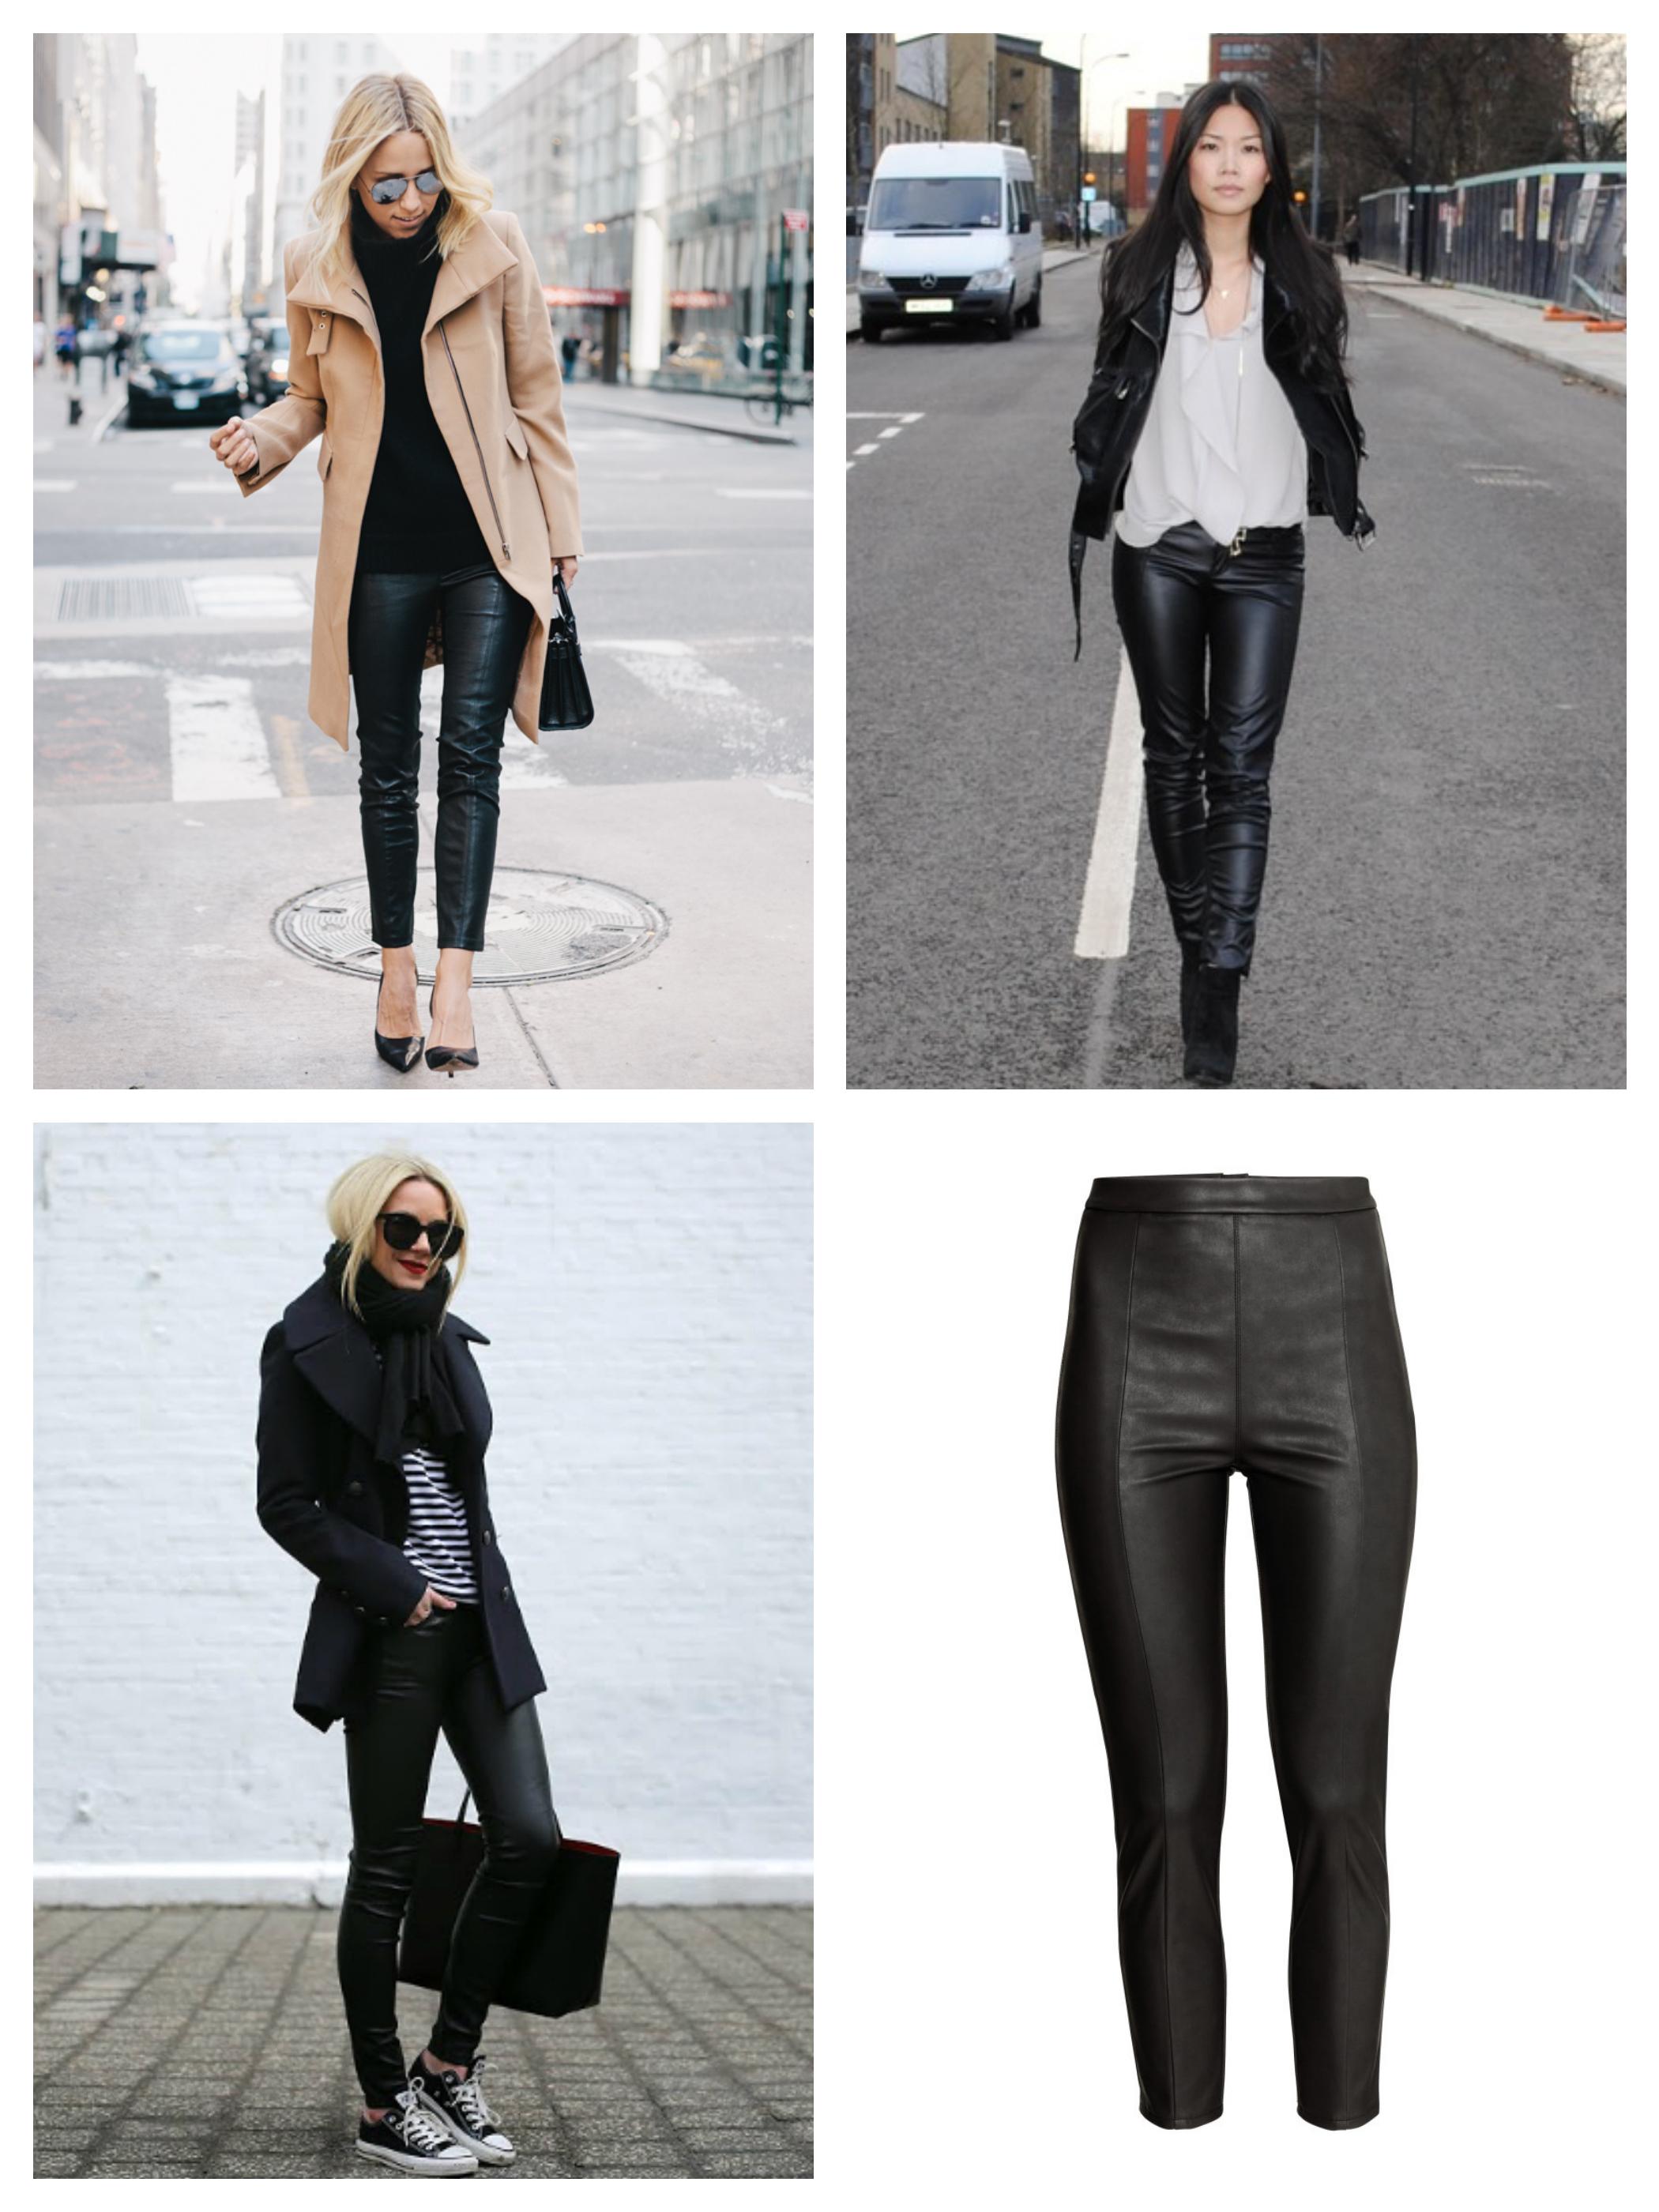 hmprod_Fotor_Collage.leatherleggings